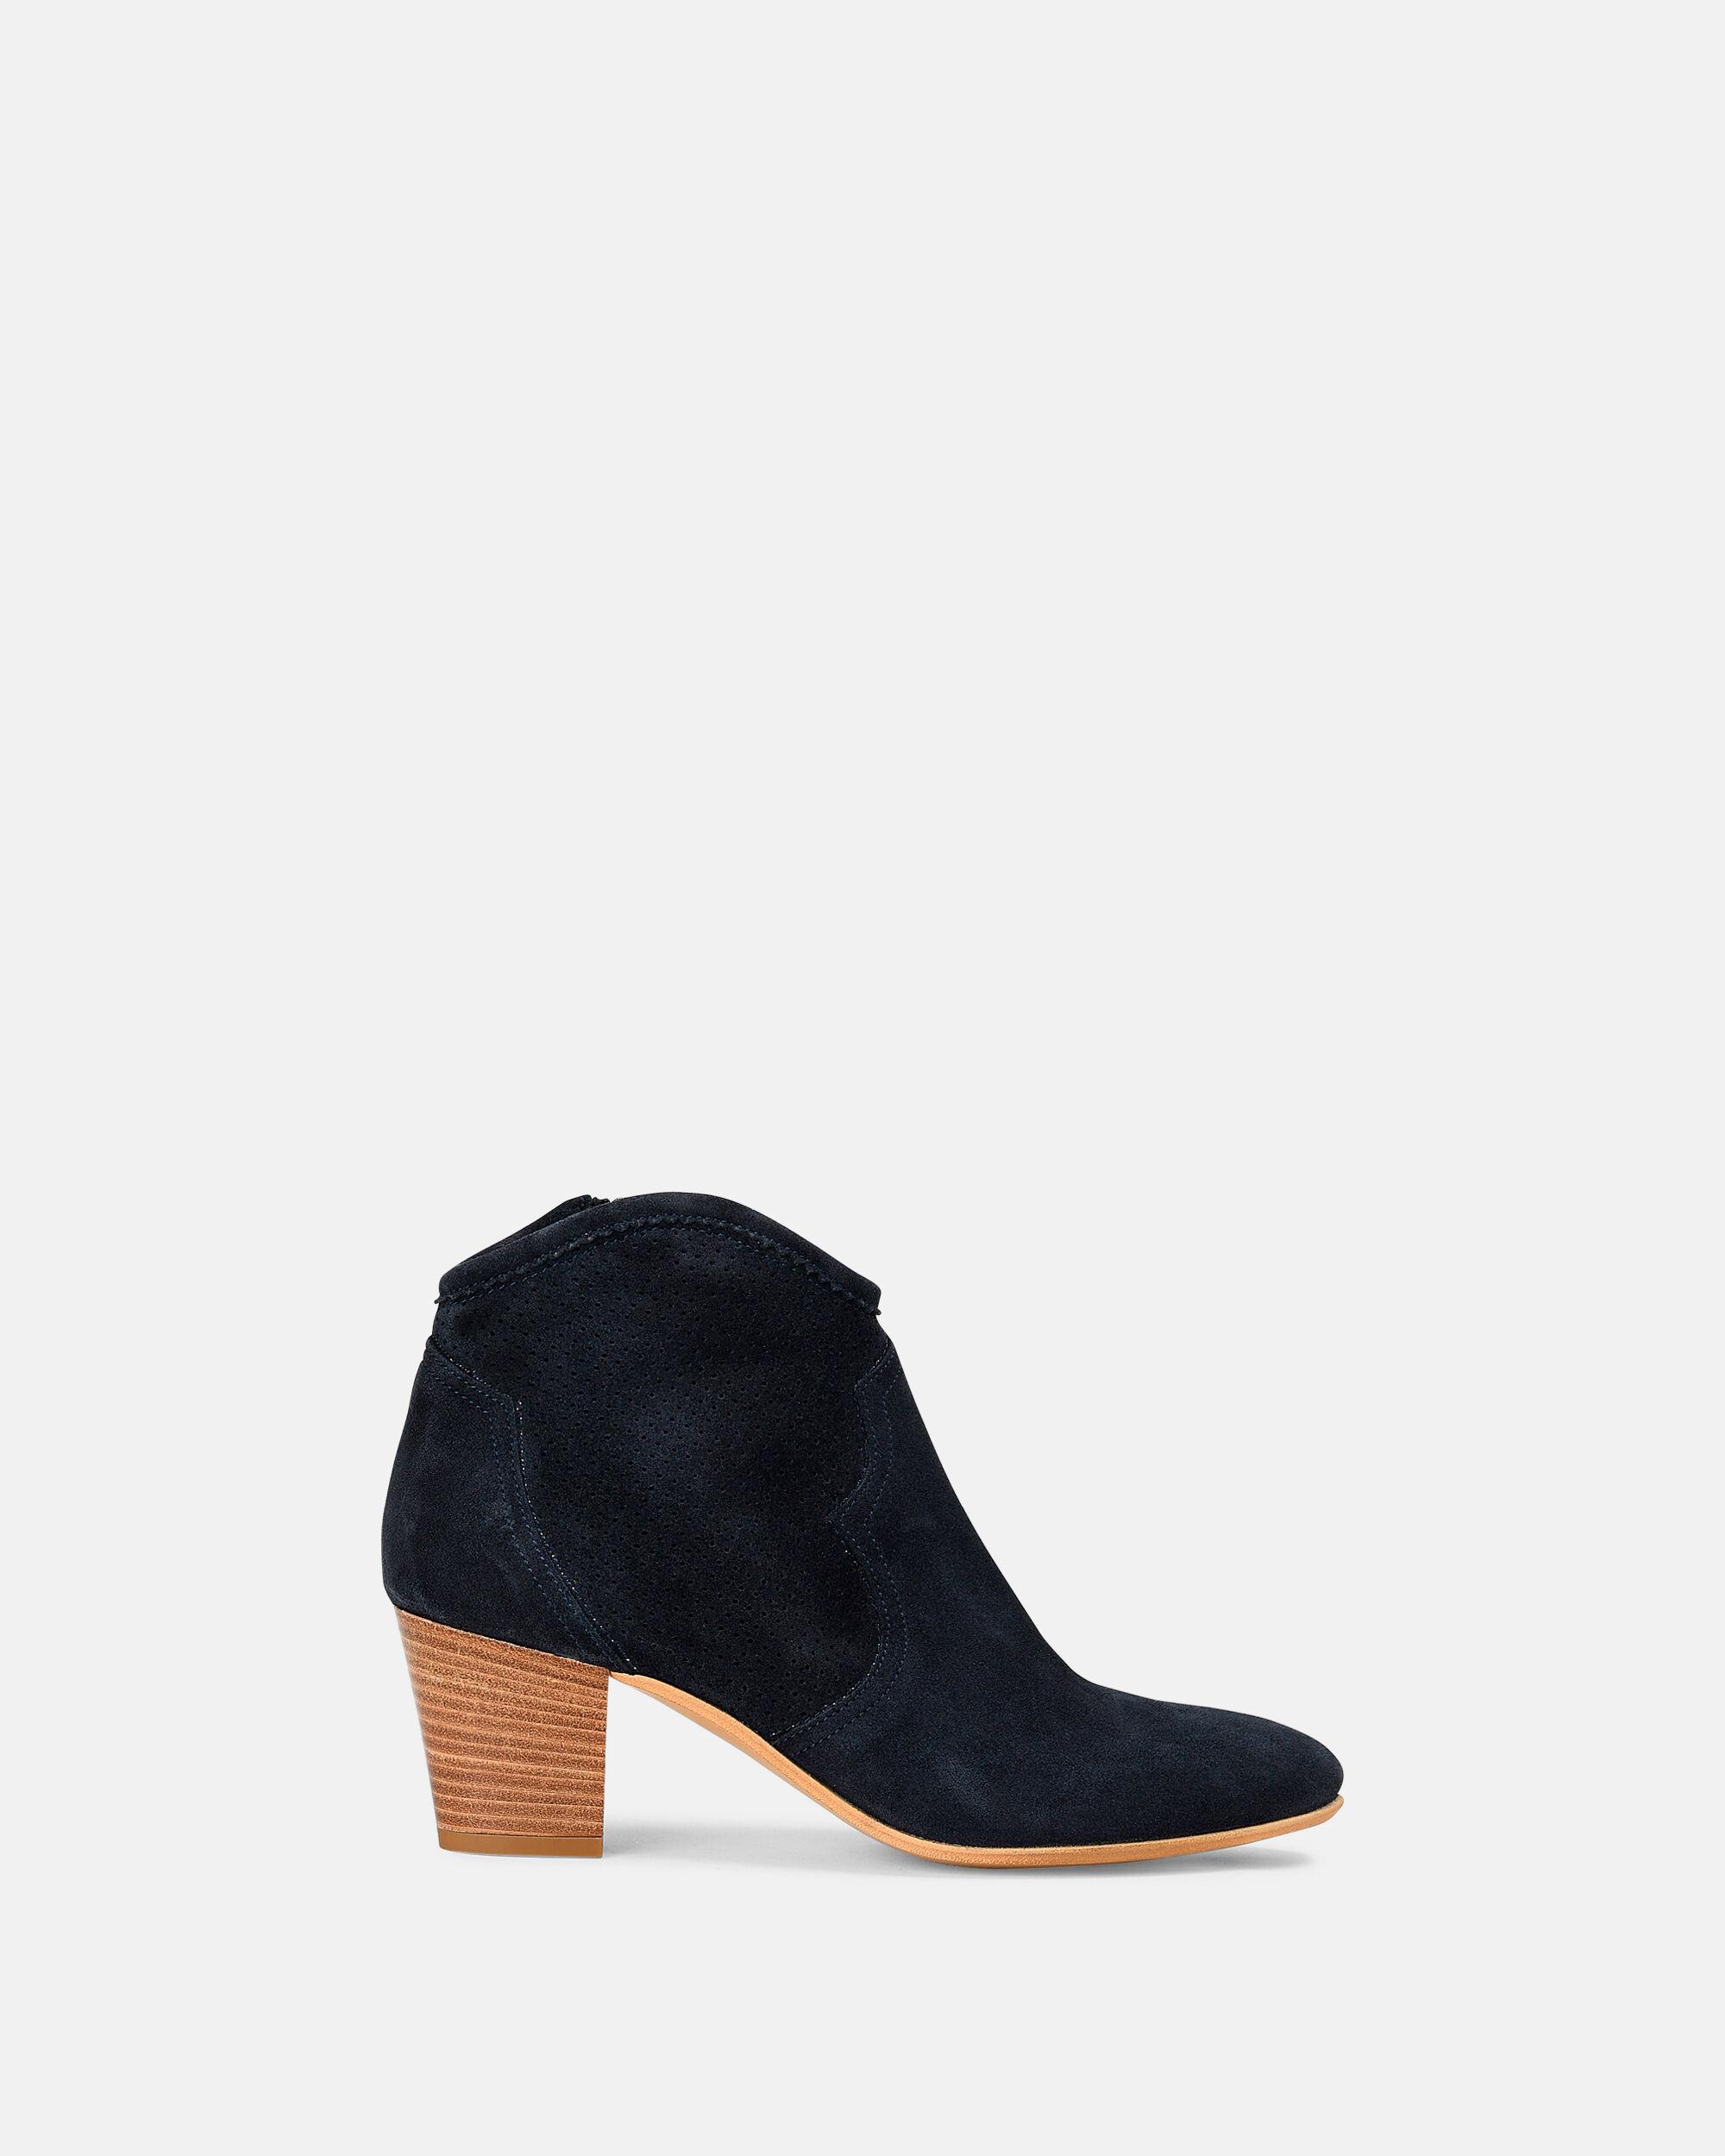 Boots - Selma